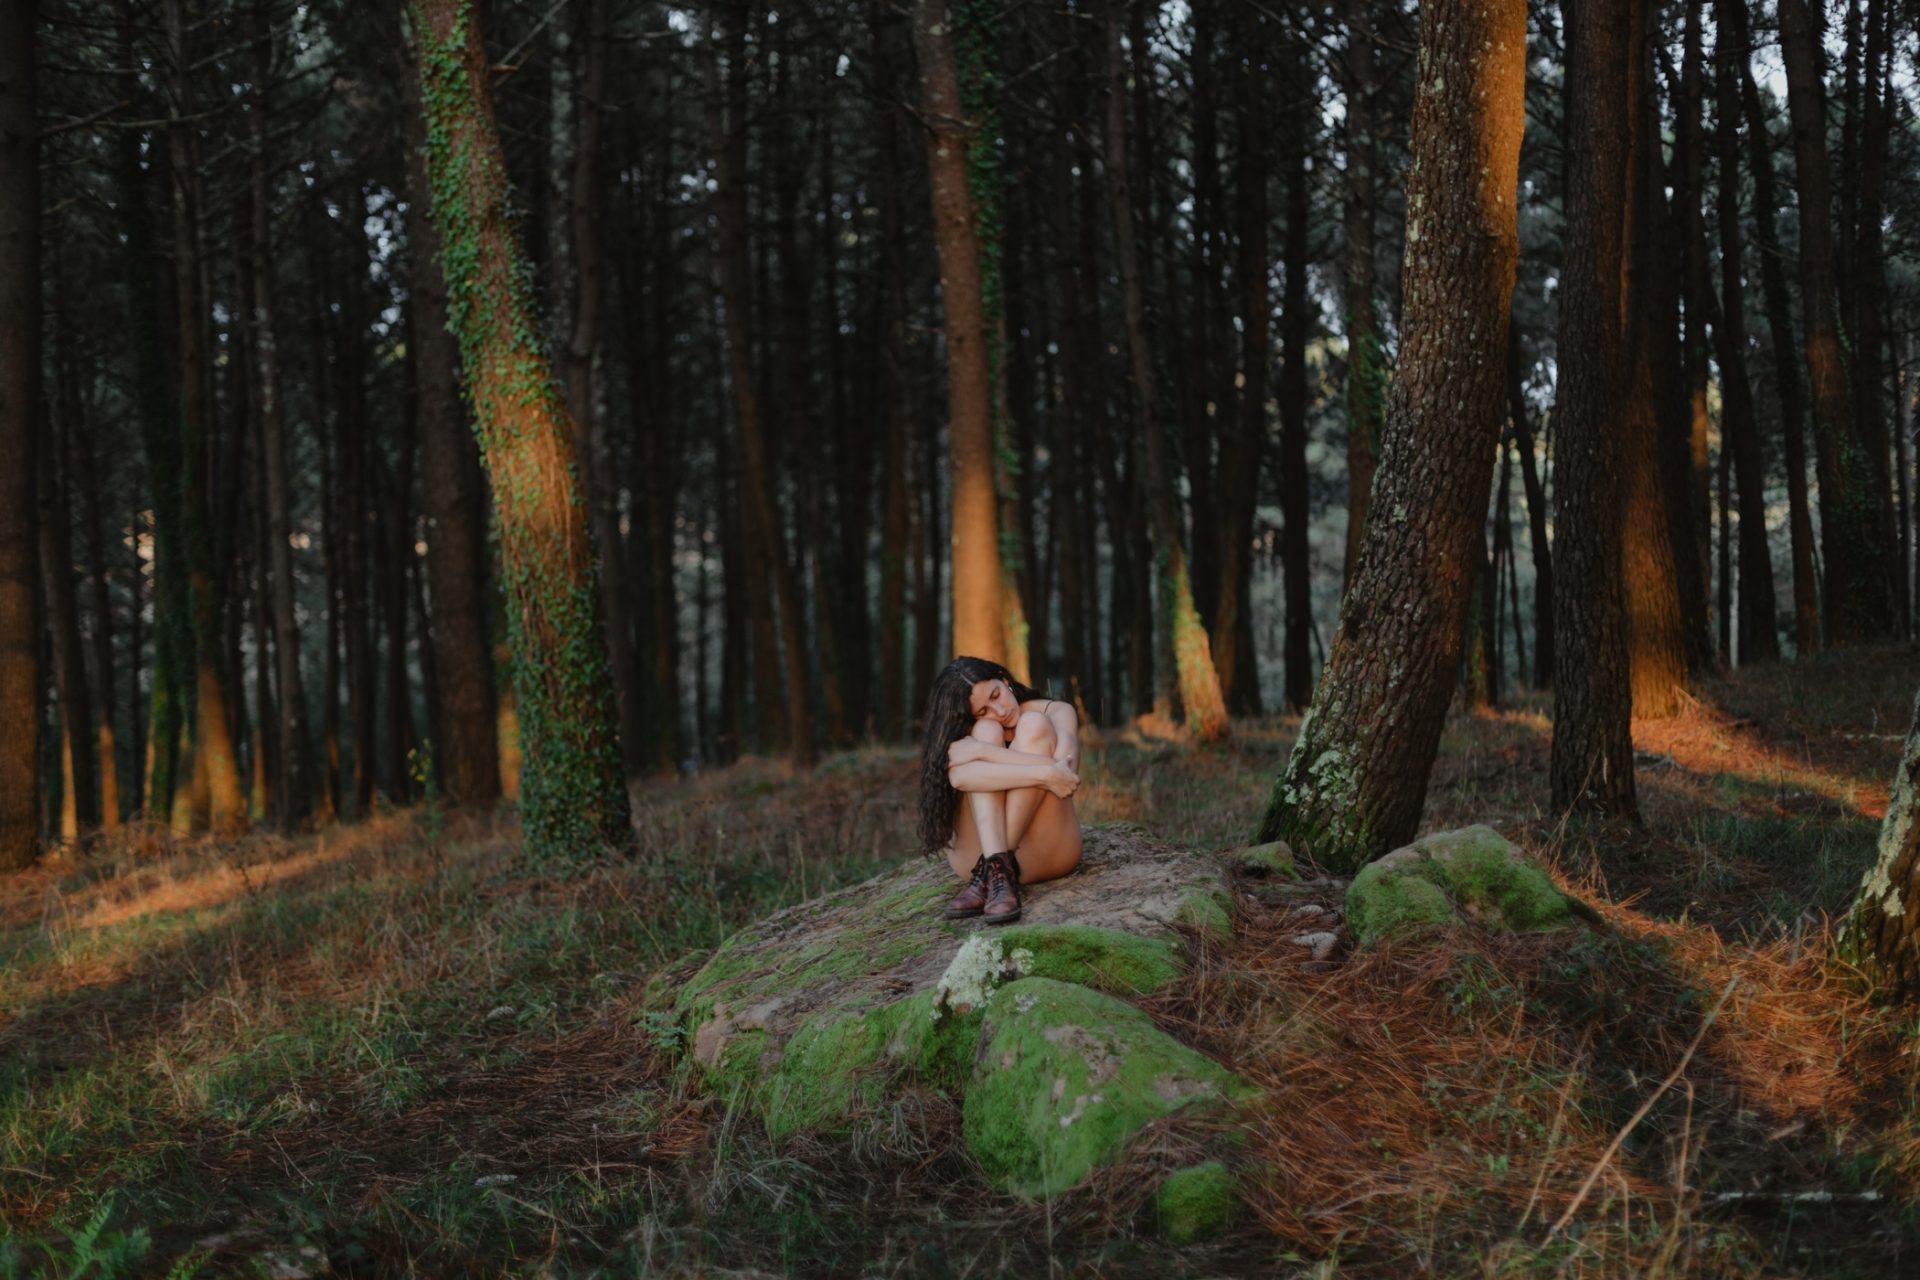 Fotografía creativa en bosque - Isla de Aurosa